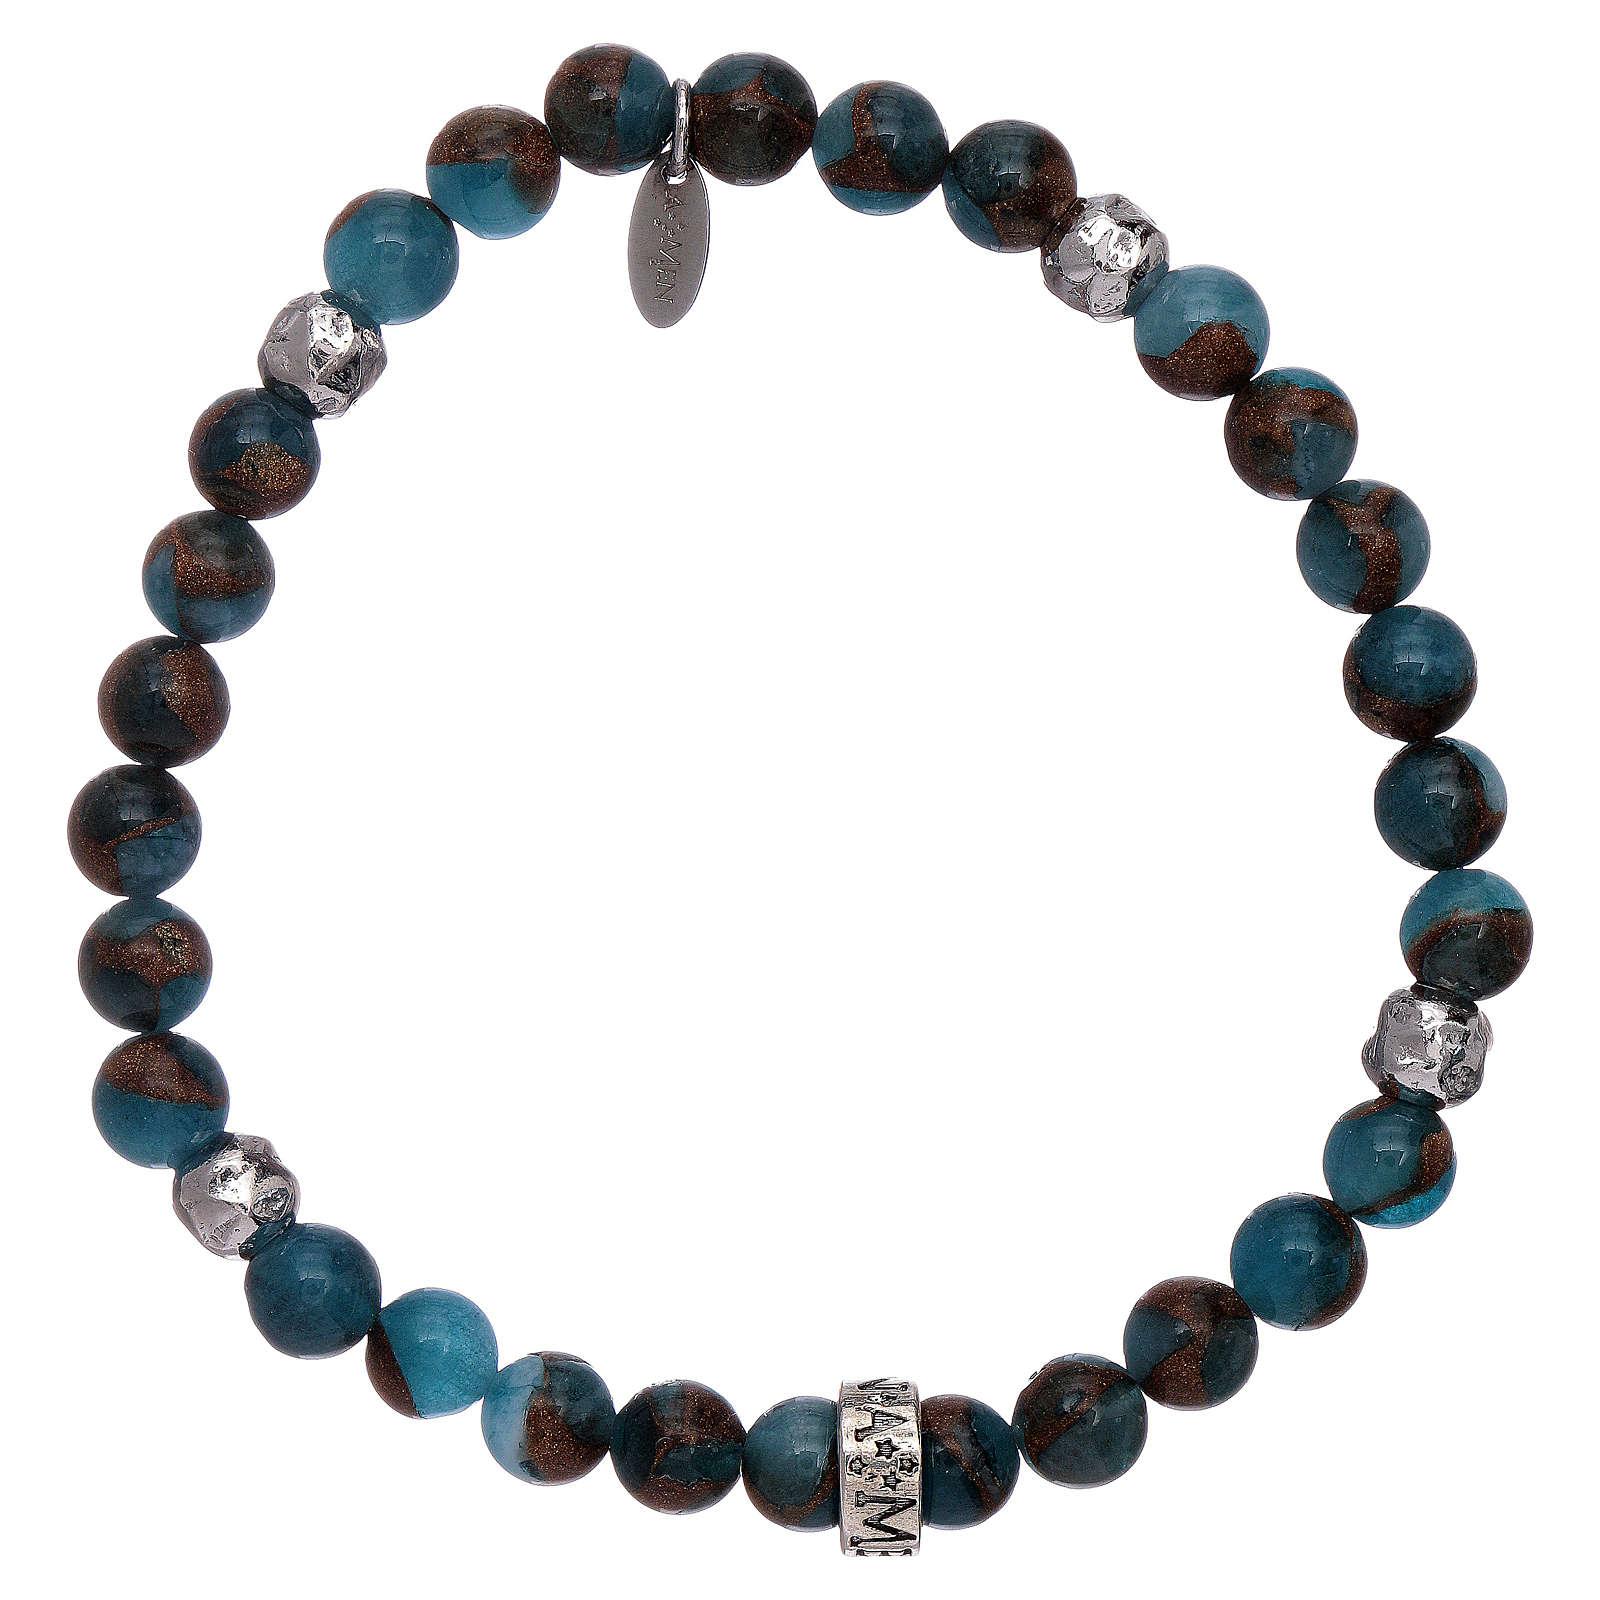 AMEN 925 sterling silver blue agate bracelet with bronzite veining 4